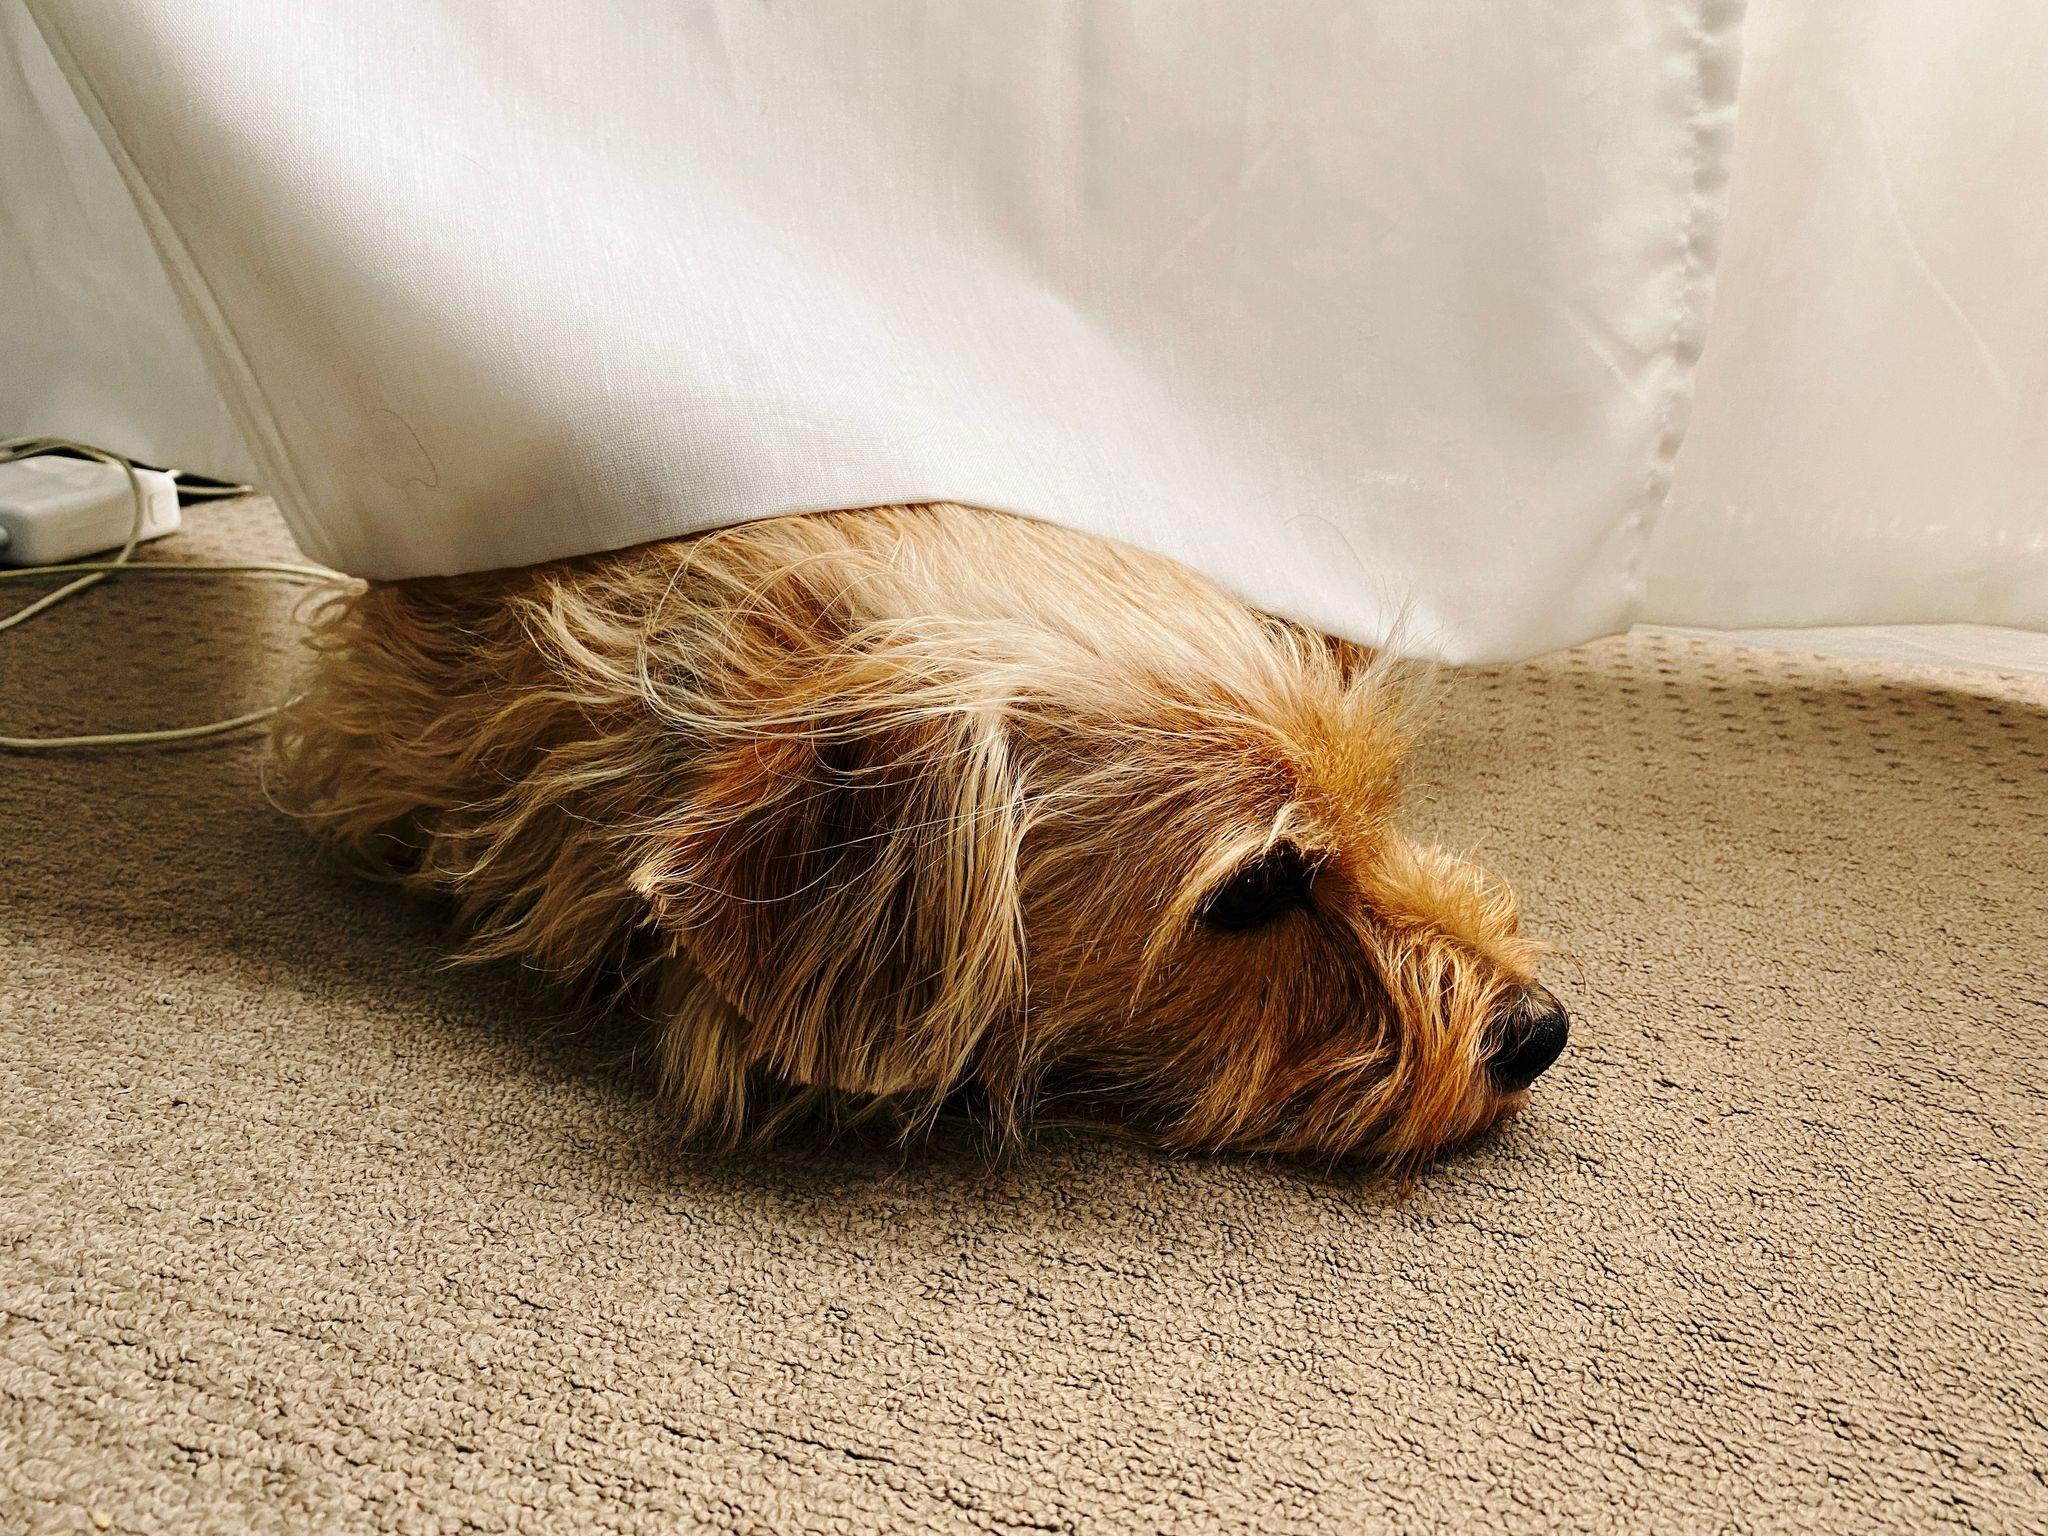 A photo of a small scruffy blonde log lying half-underneath a sheer white curtain